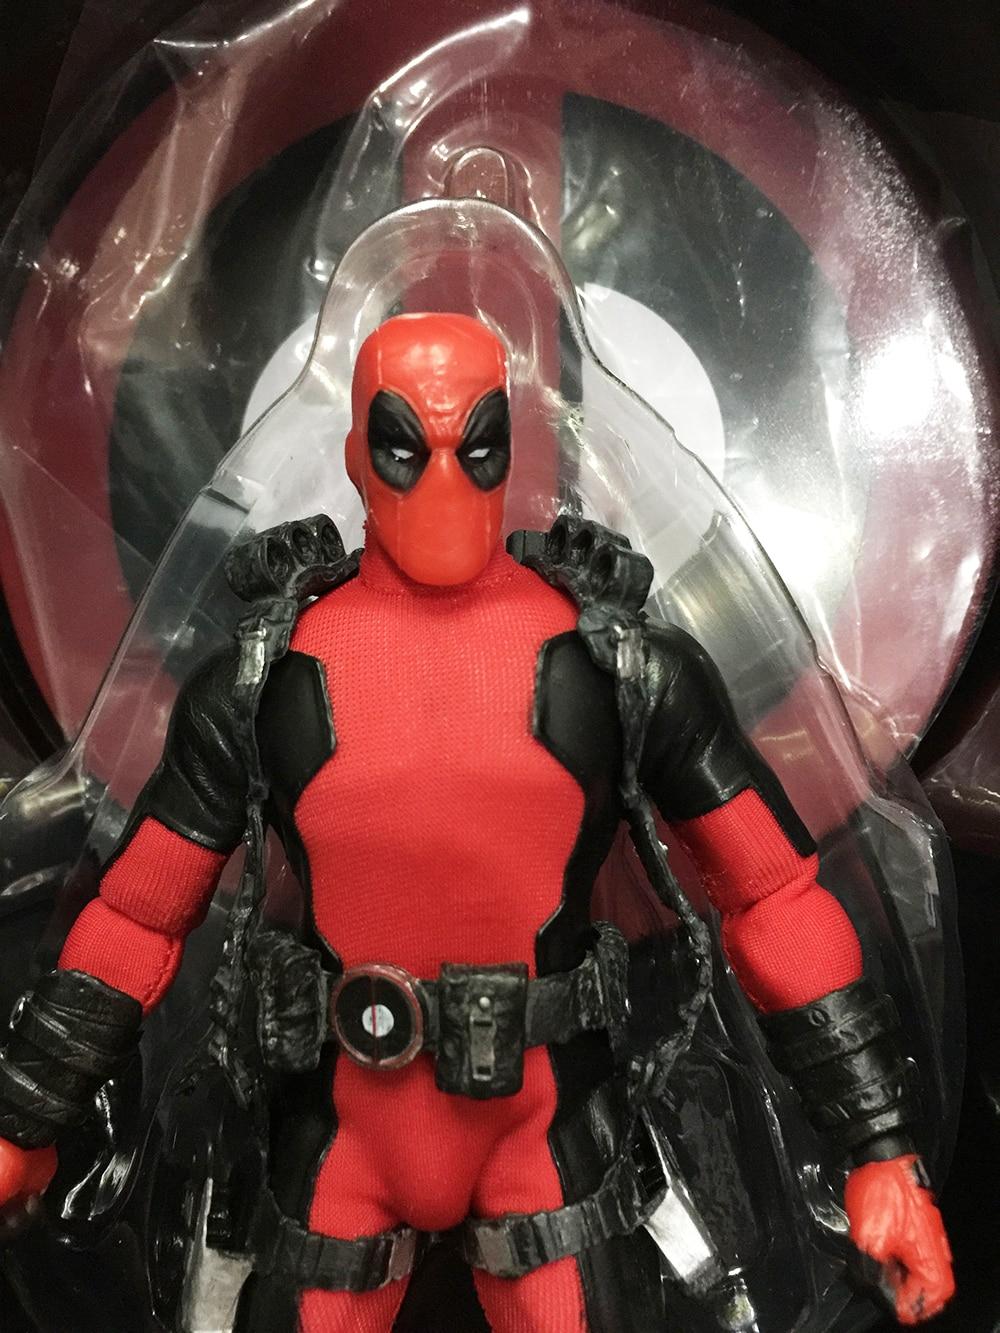 Marvel Super Hero Deadpool X-Men Mezco One 12 Action Figures Toys  (11)